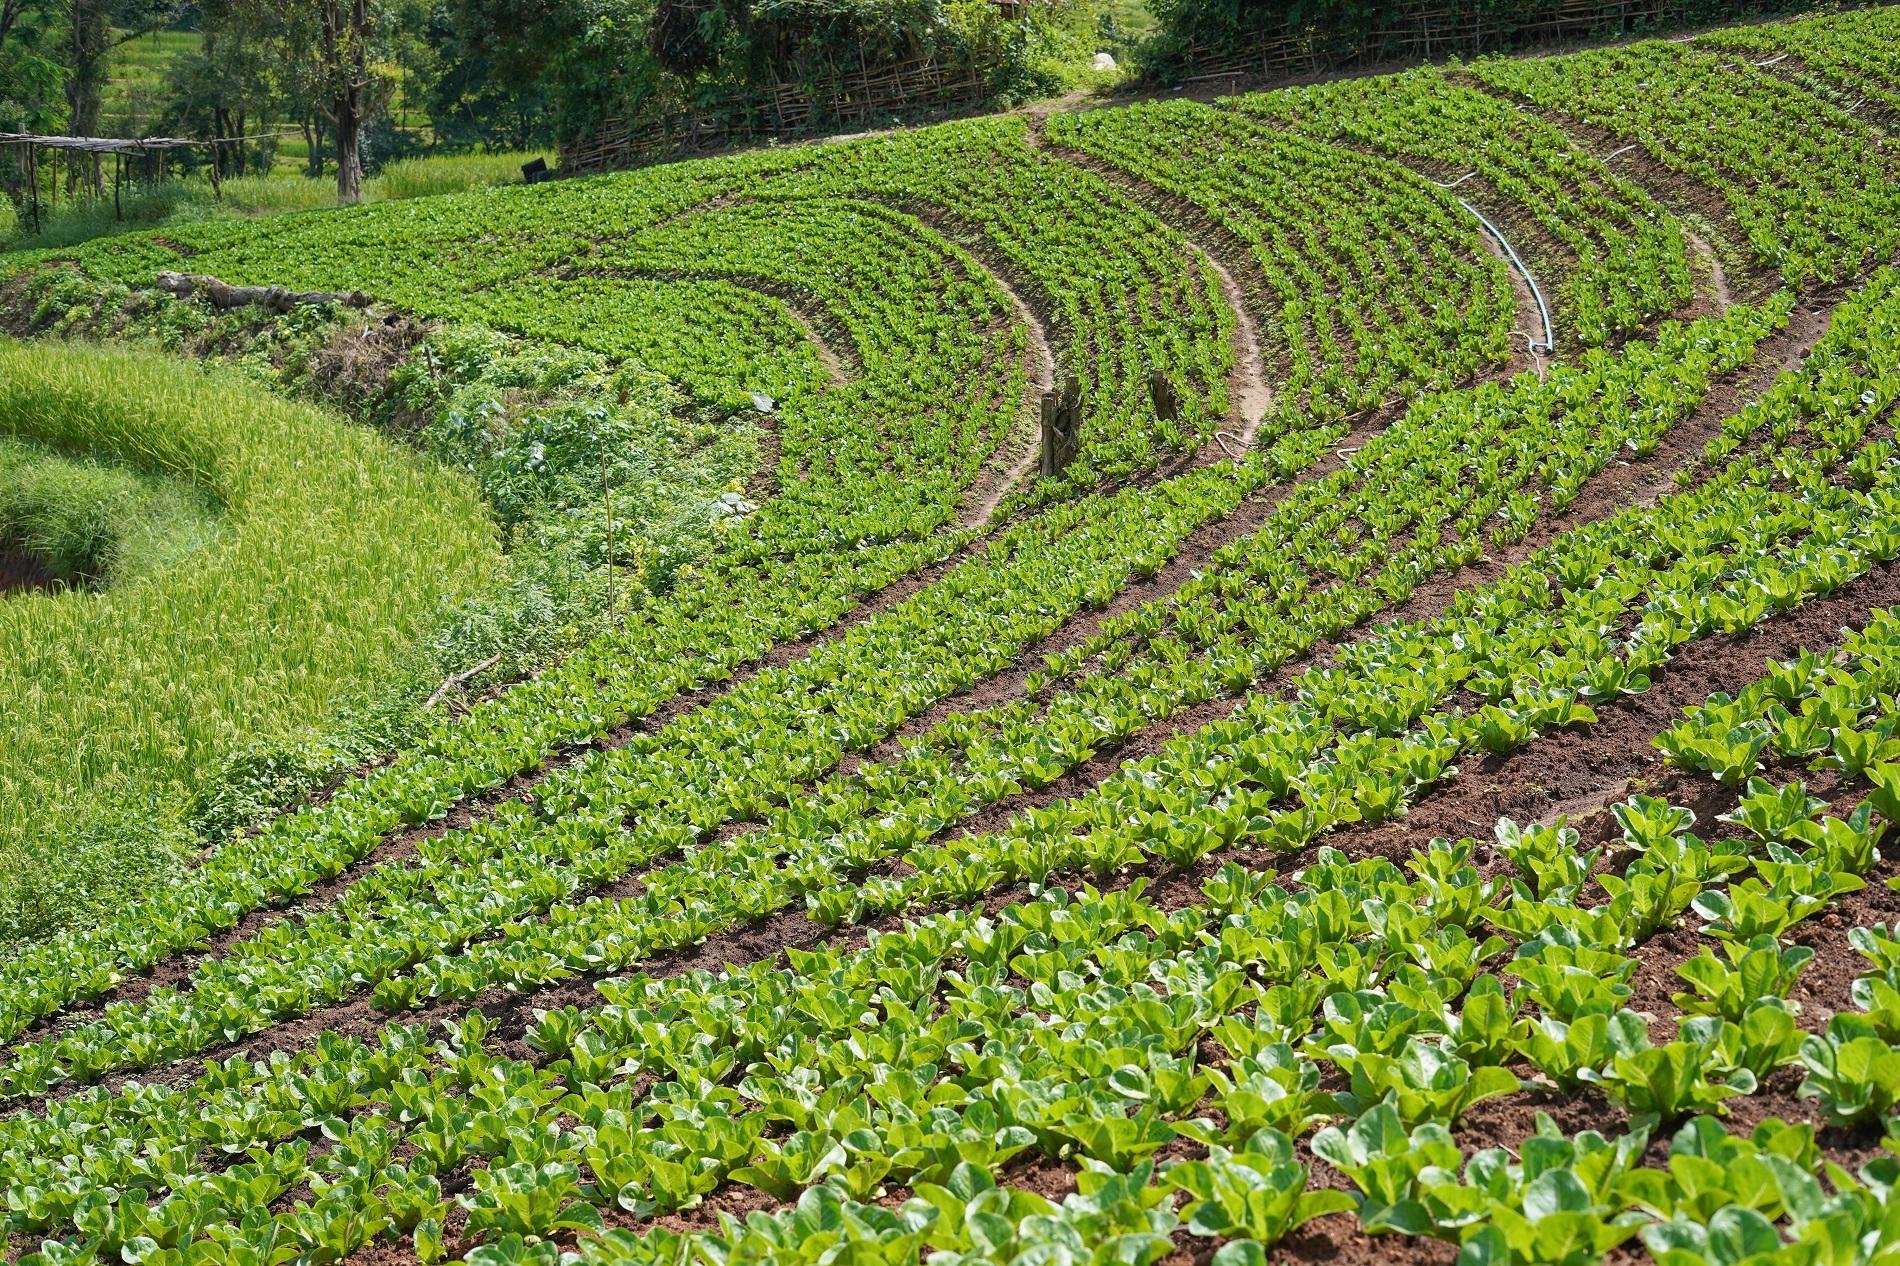 Buenas prácticas agrícolas: Conservación del entorno agrícola